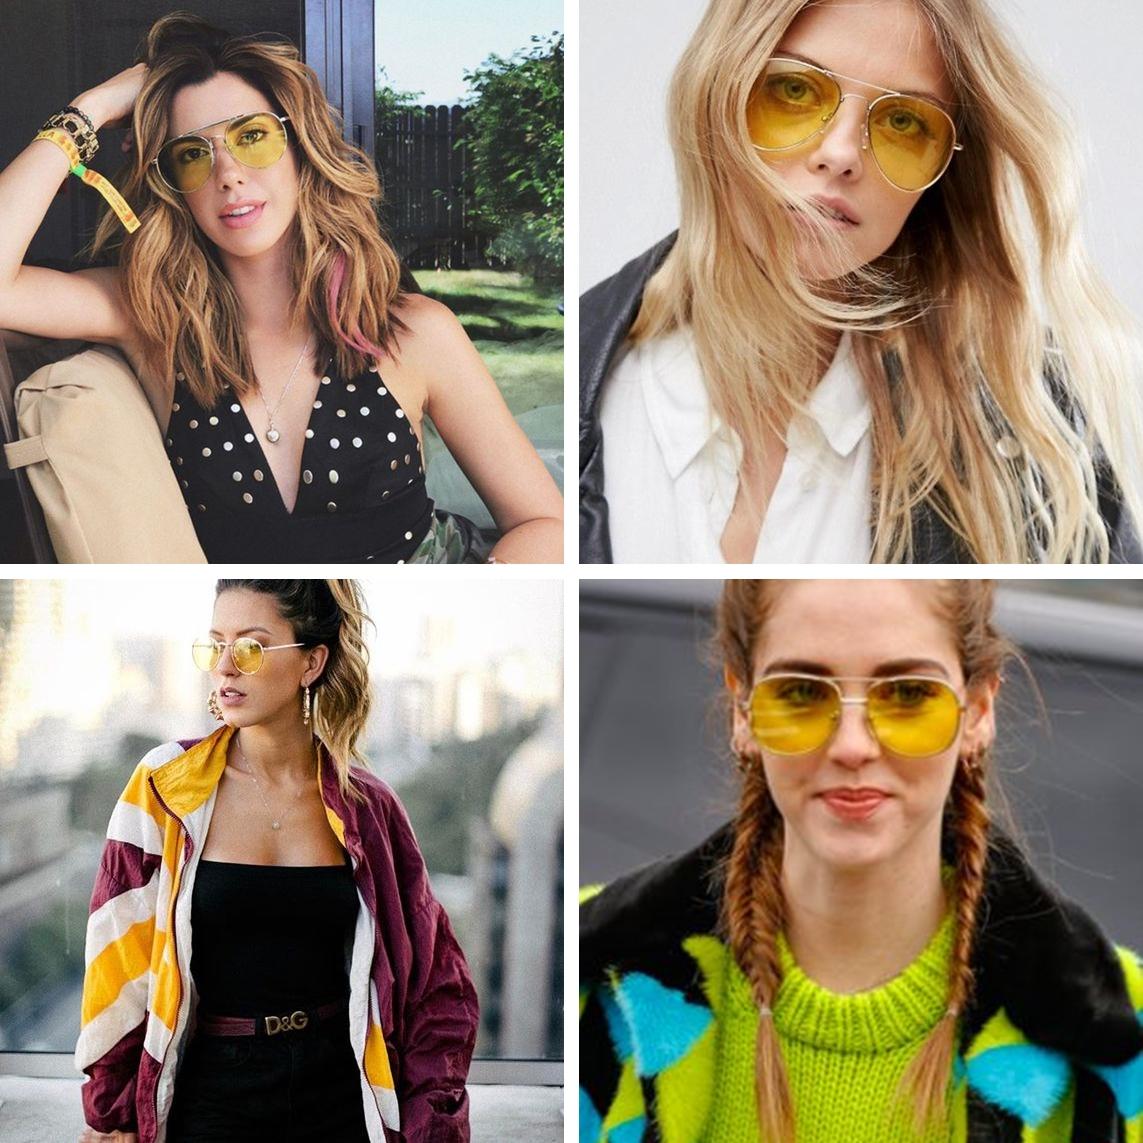 Lente amarela é tendencia2 - Trendy: Óculos de Lente Amarela